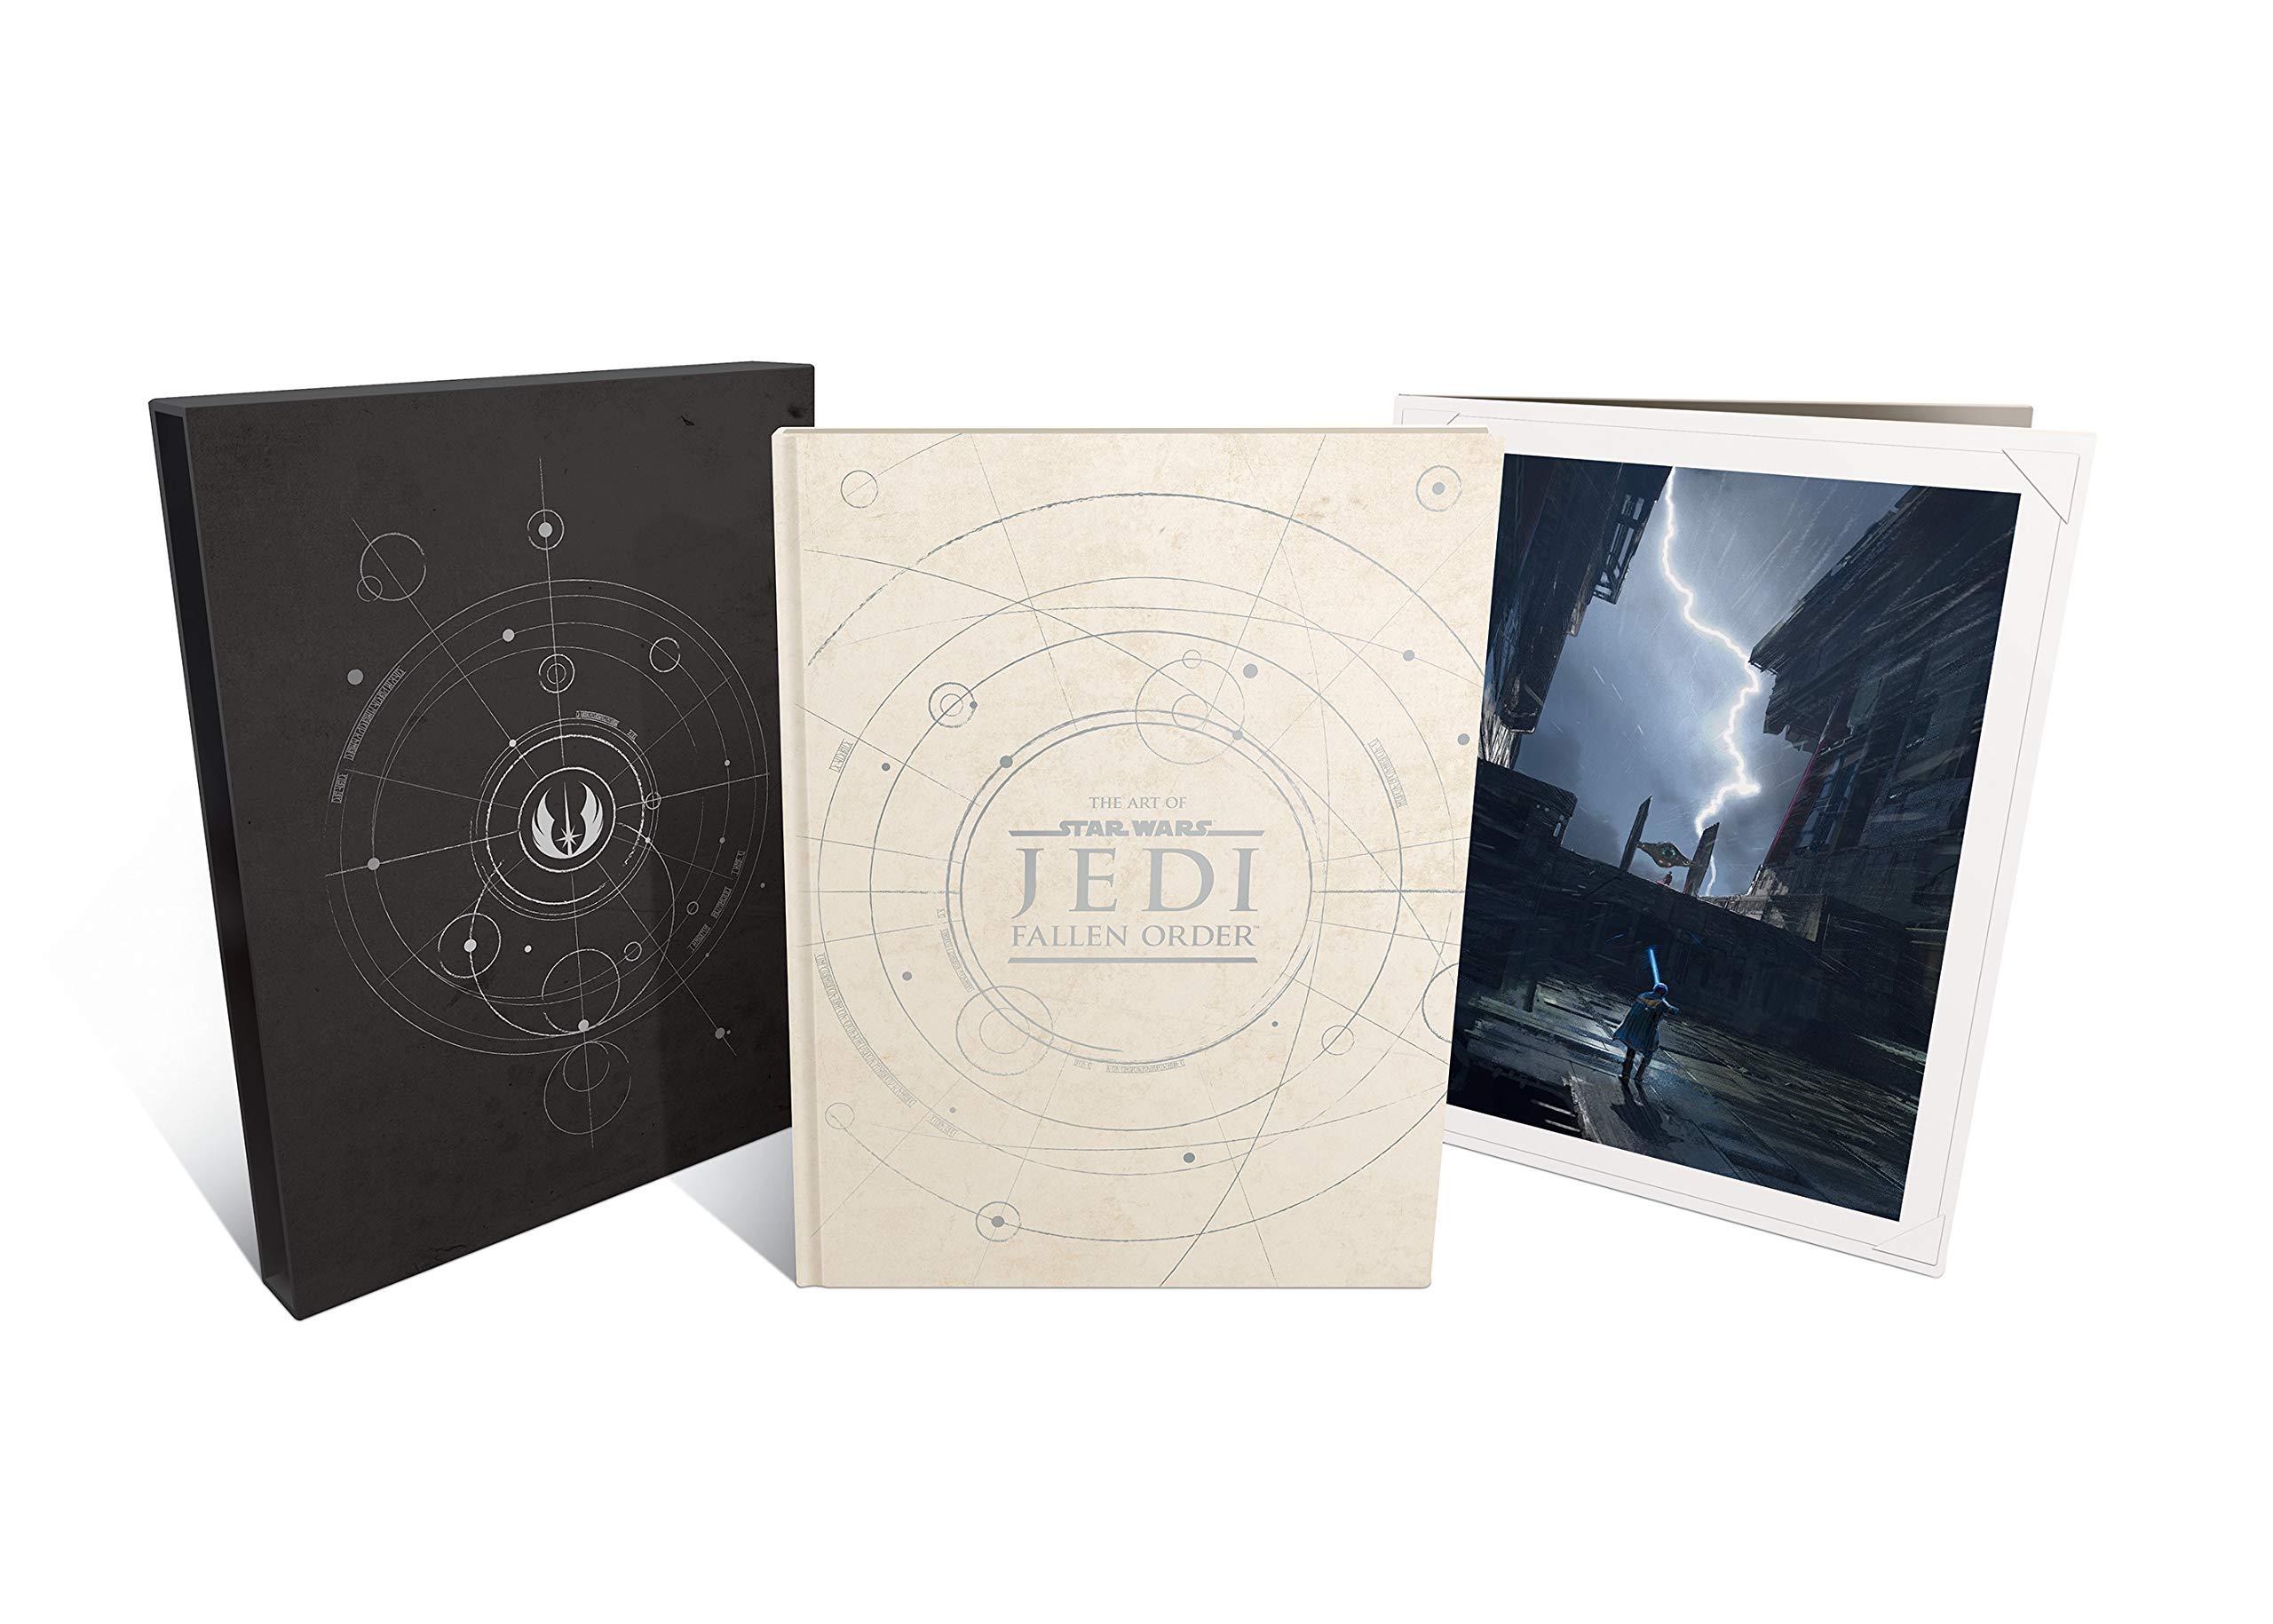 The Art of Star Wars Jedi: Fallen Order Limited Edition by Dark Horse Books